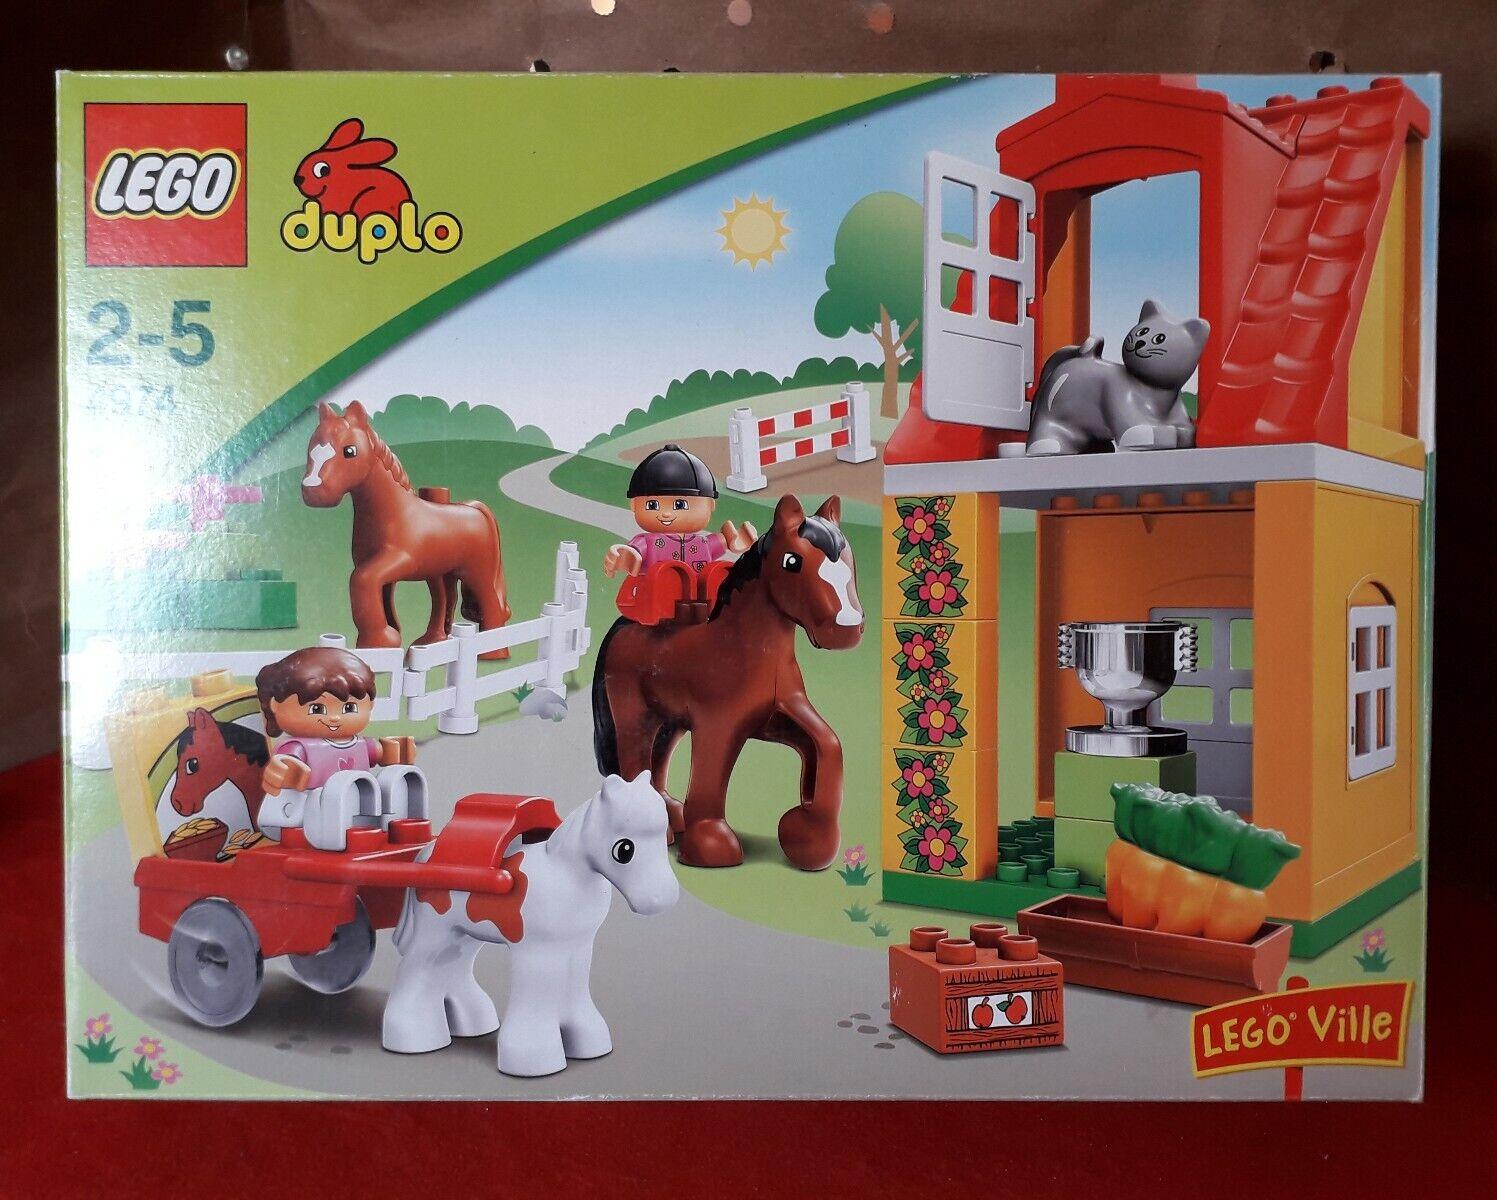 Lego Duplo 4974 Horse Stables - completo al 100%